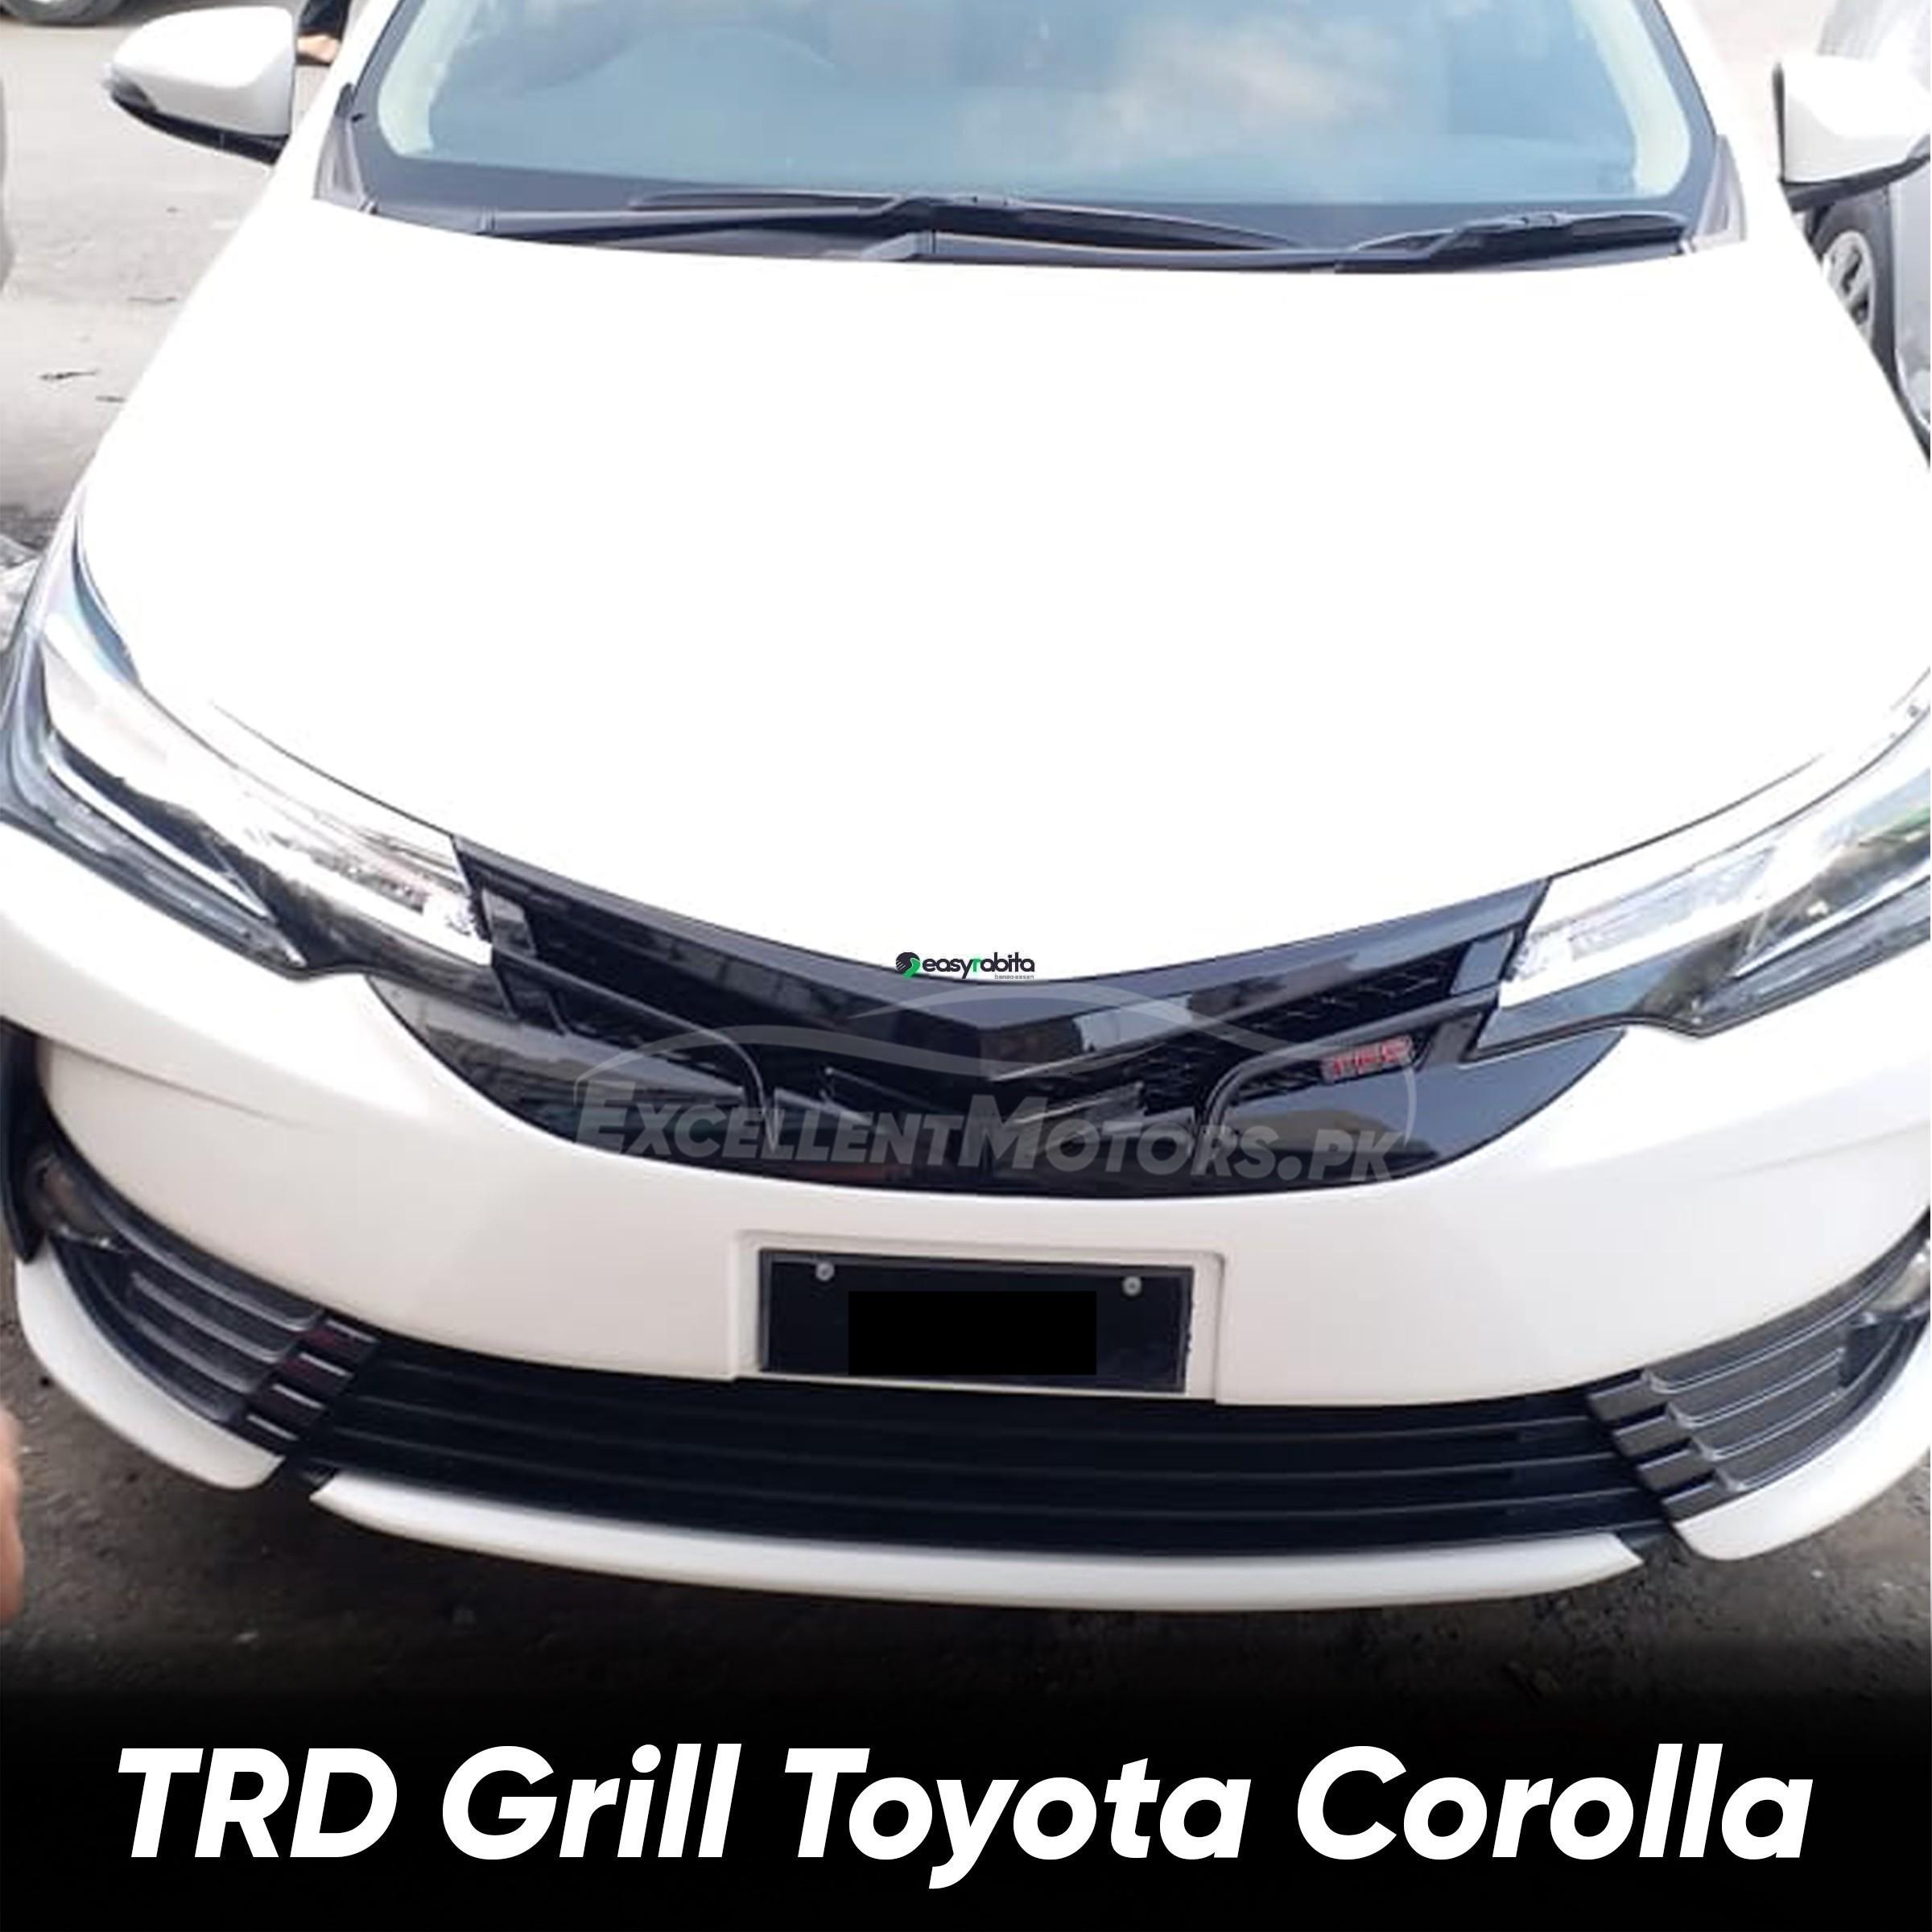 TRD Grill Toyota Corolla